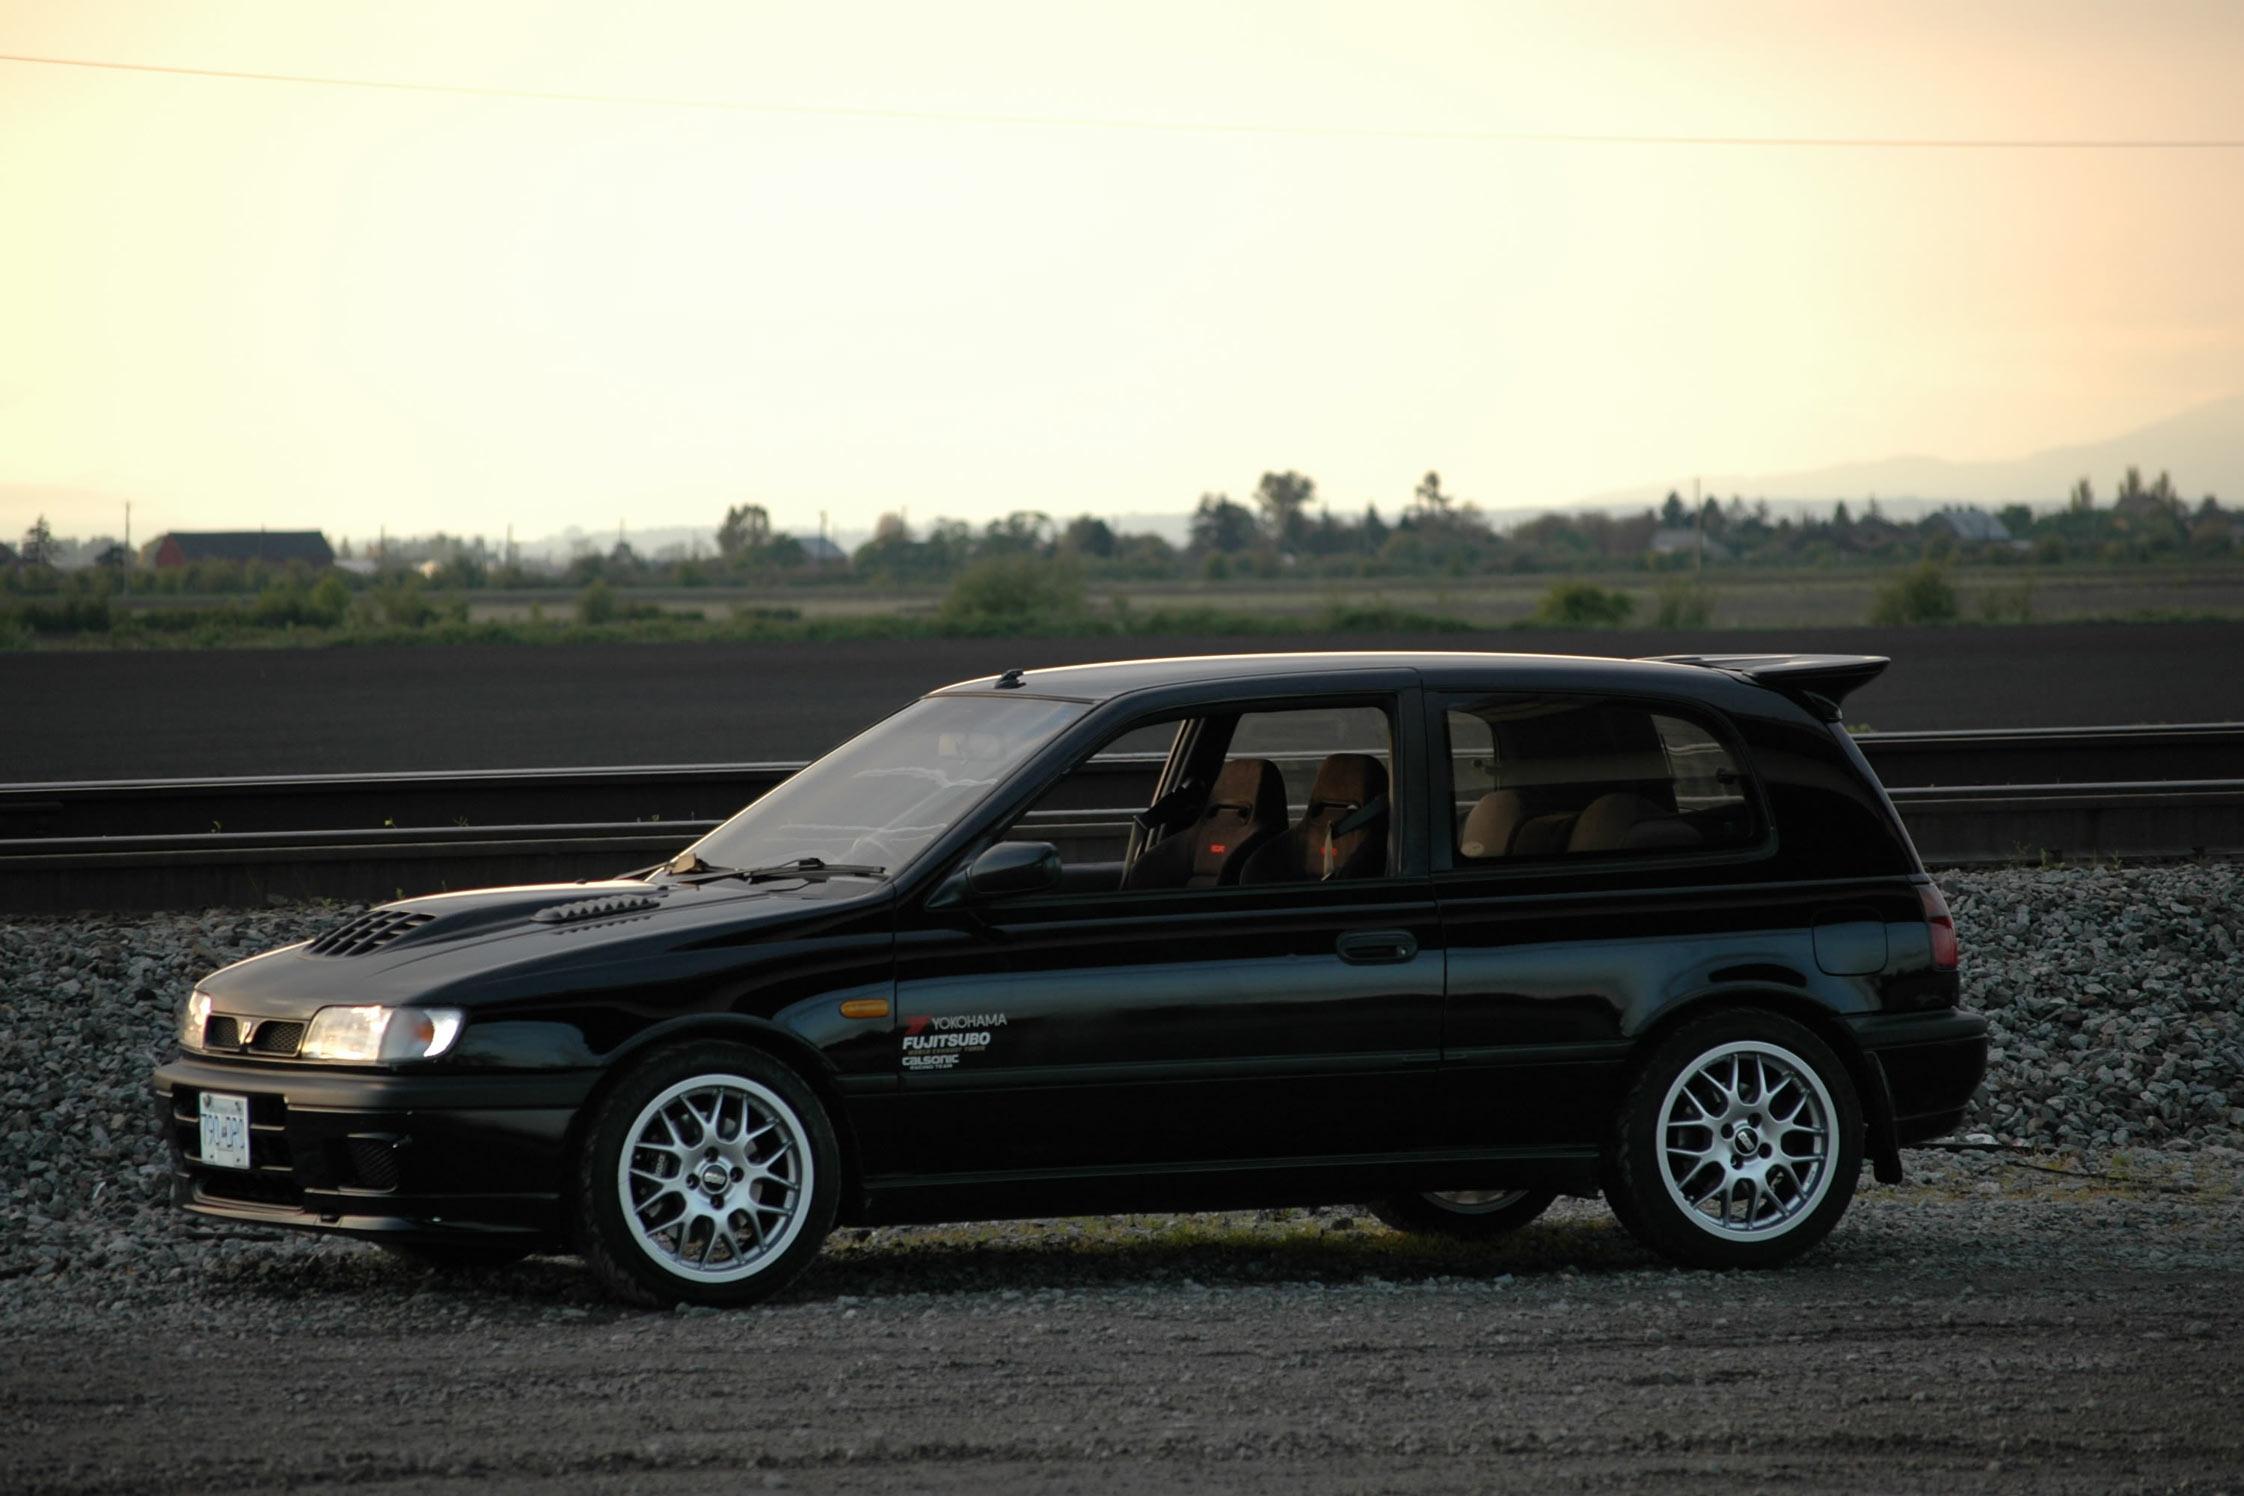 crx community forum view topic post favorite best automotive pics. Black Bedroom Furniture Sets. Home Design Ideas